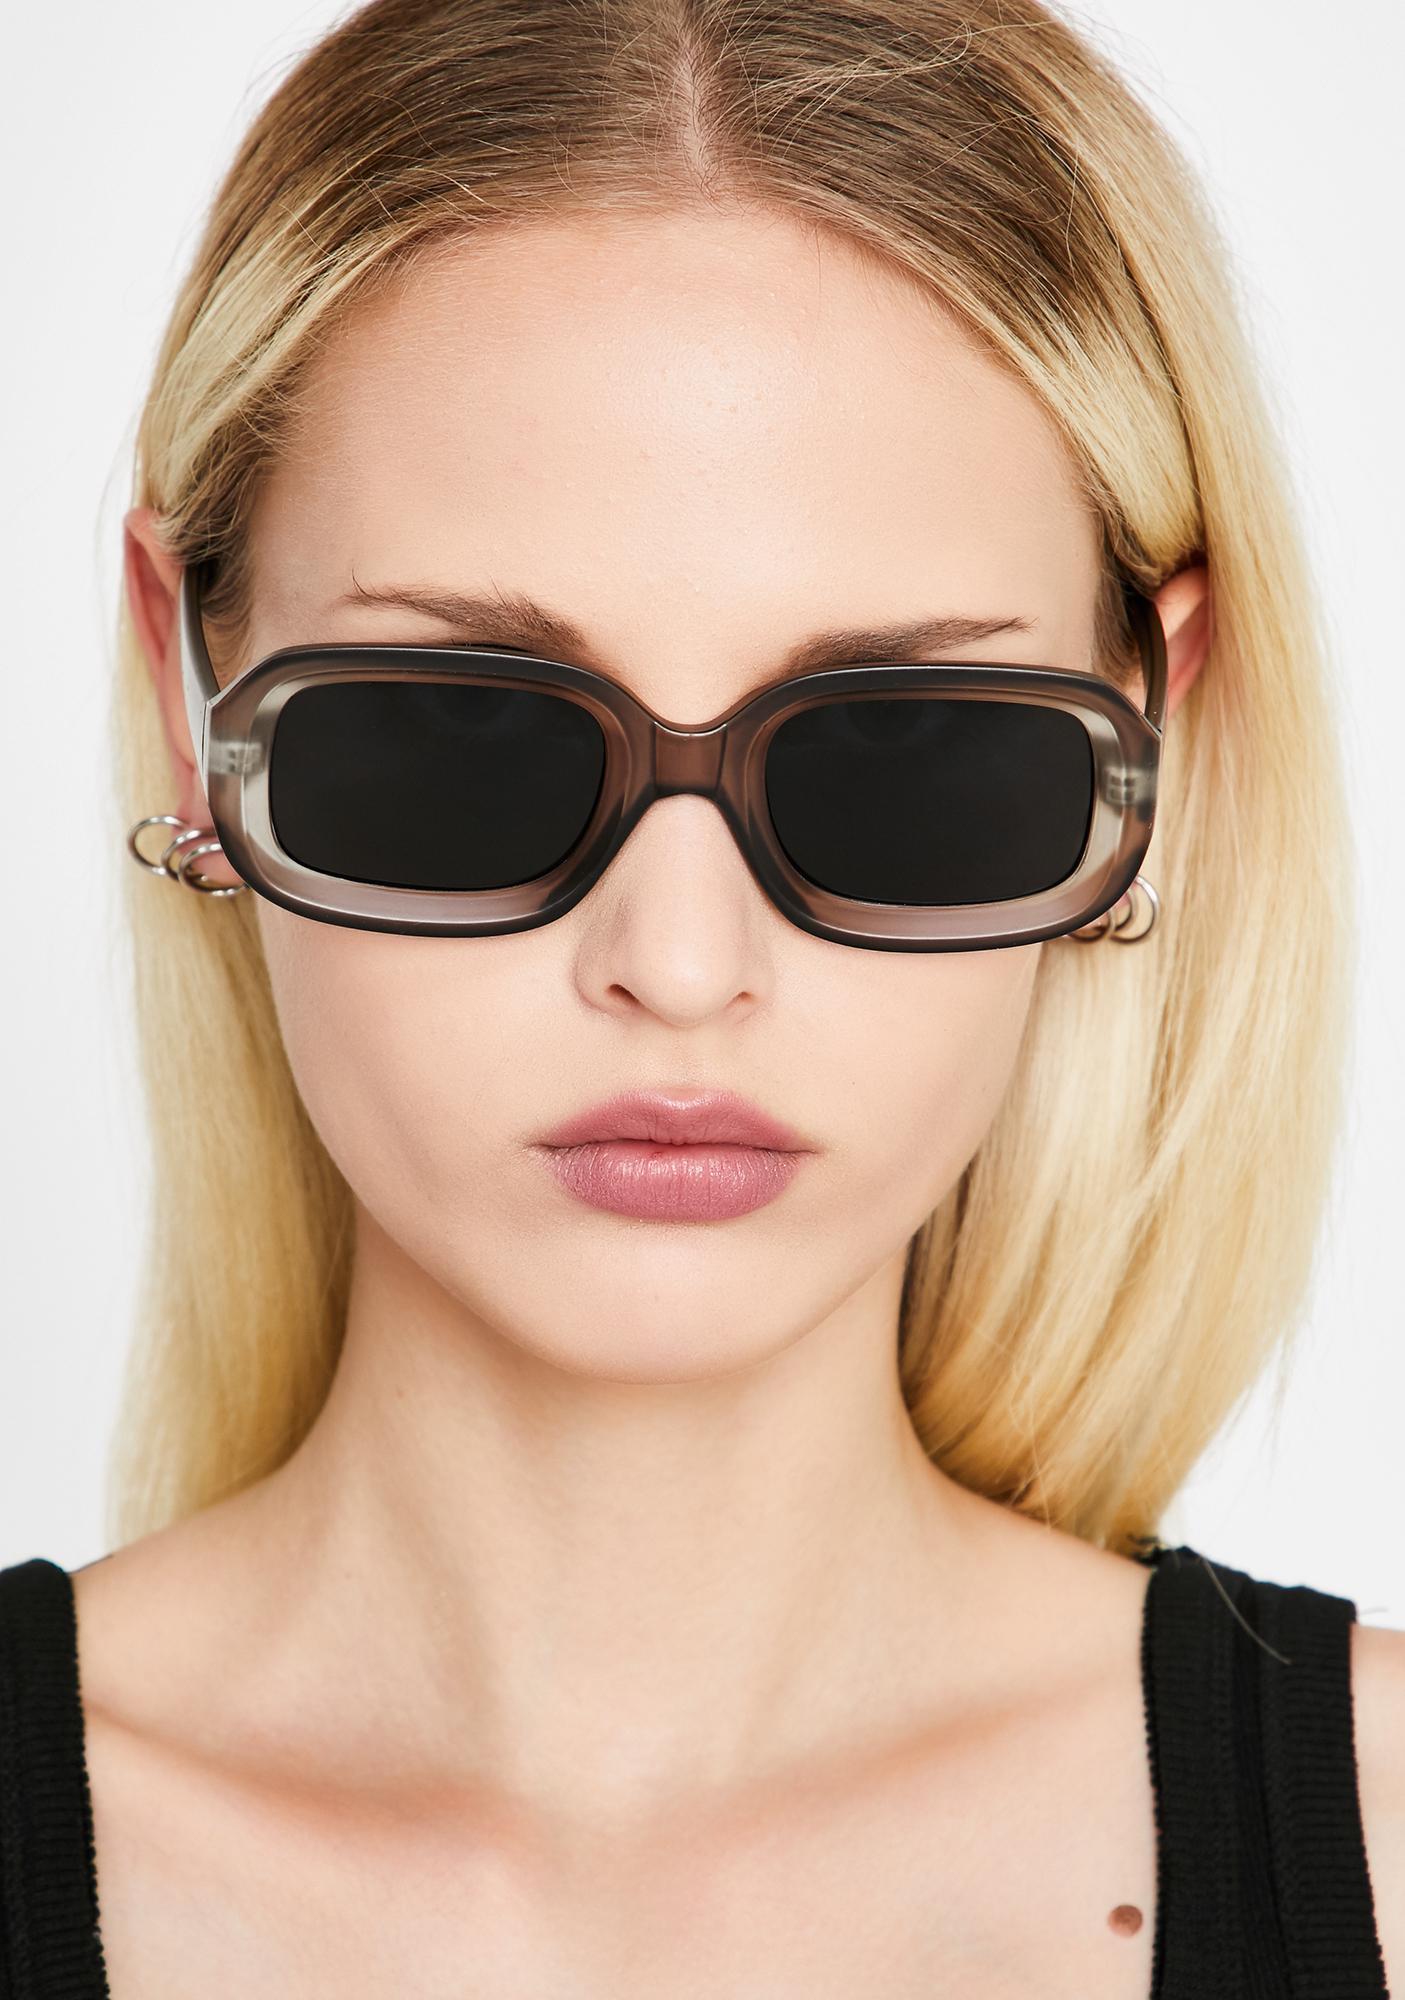 Smokin' Made Ya Look Square Sunglasses